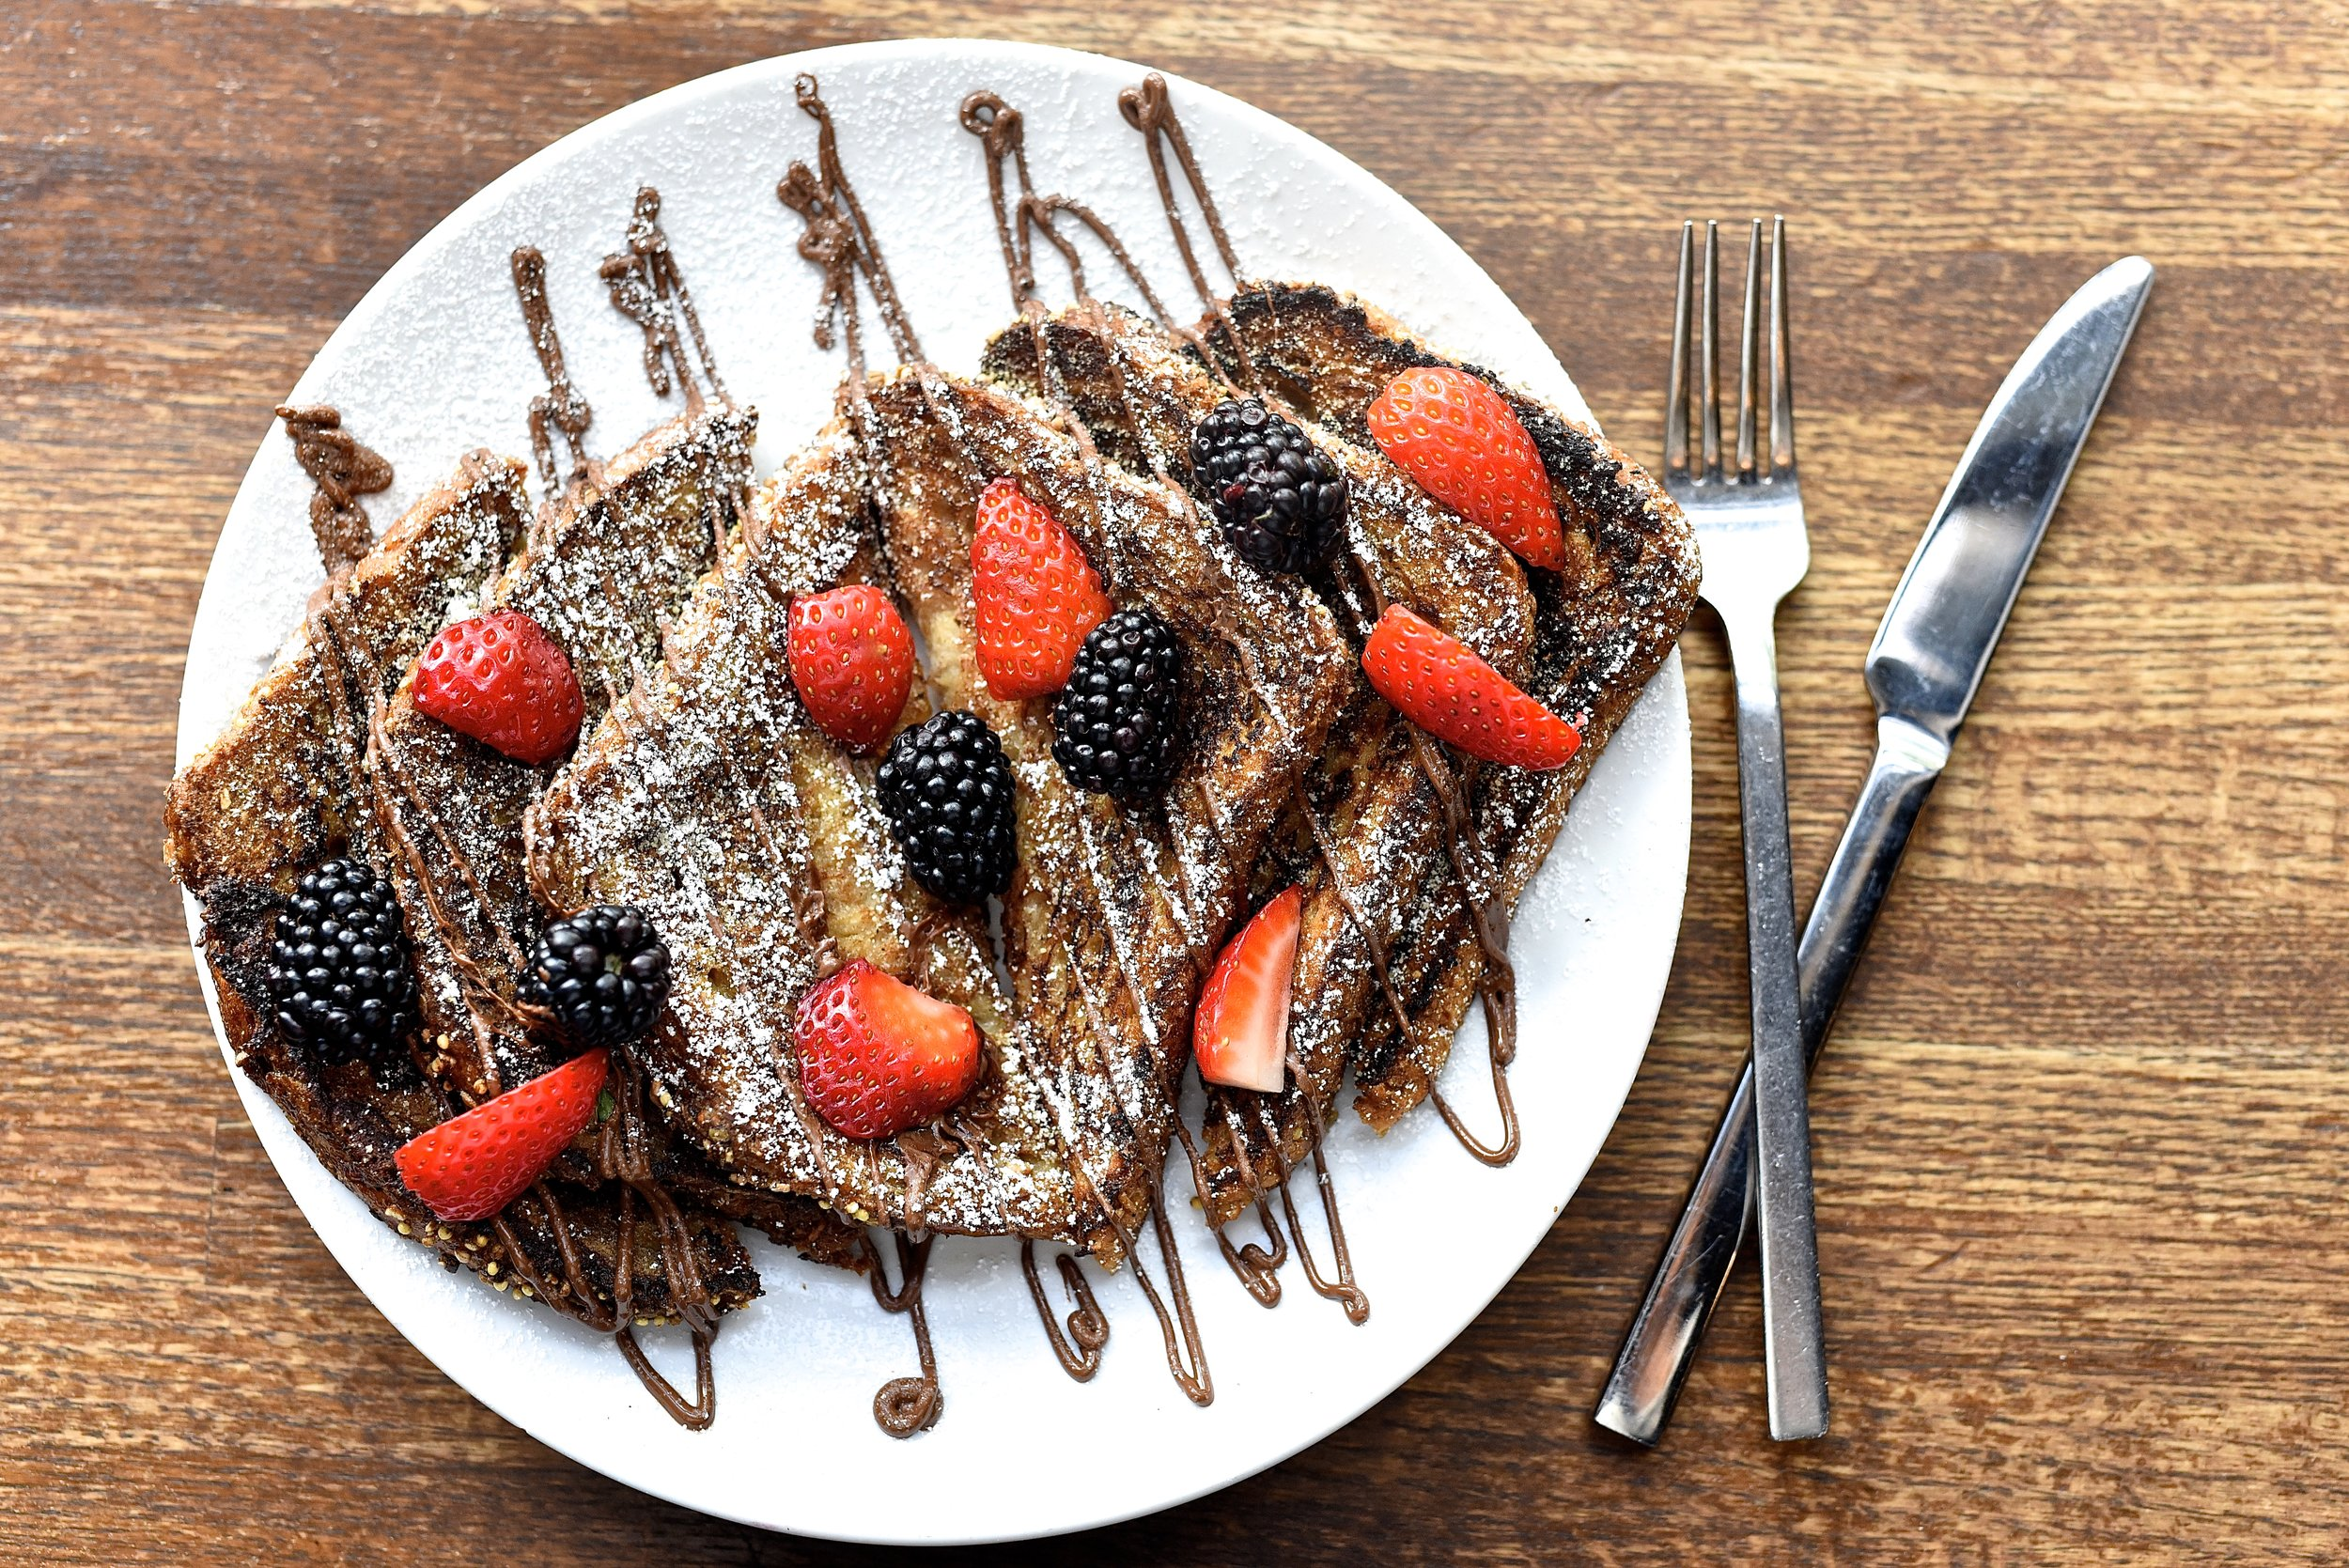 Nutella French Toast by Kimberly Park (6).JPG